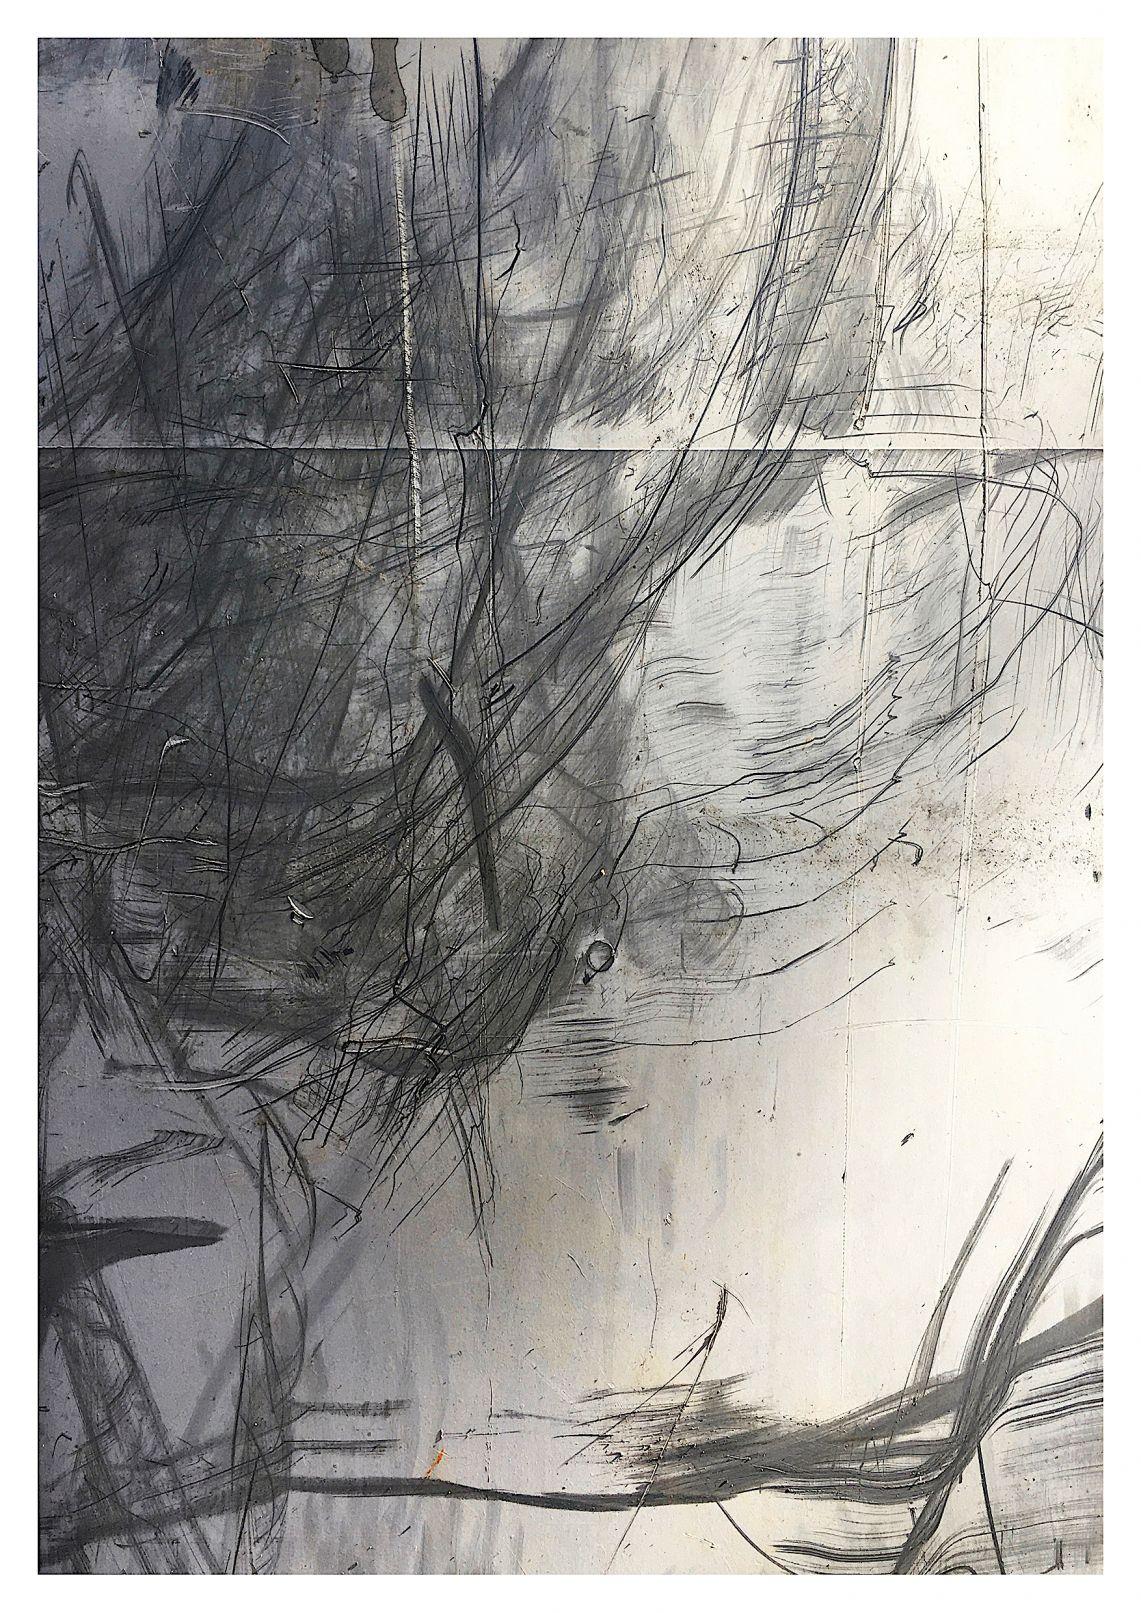 Vedado-Havana (Trash Painting X) (2017) - David Beltrán